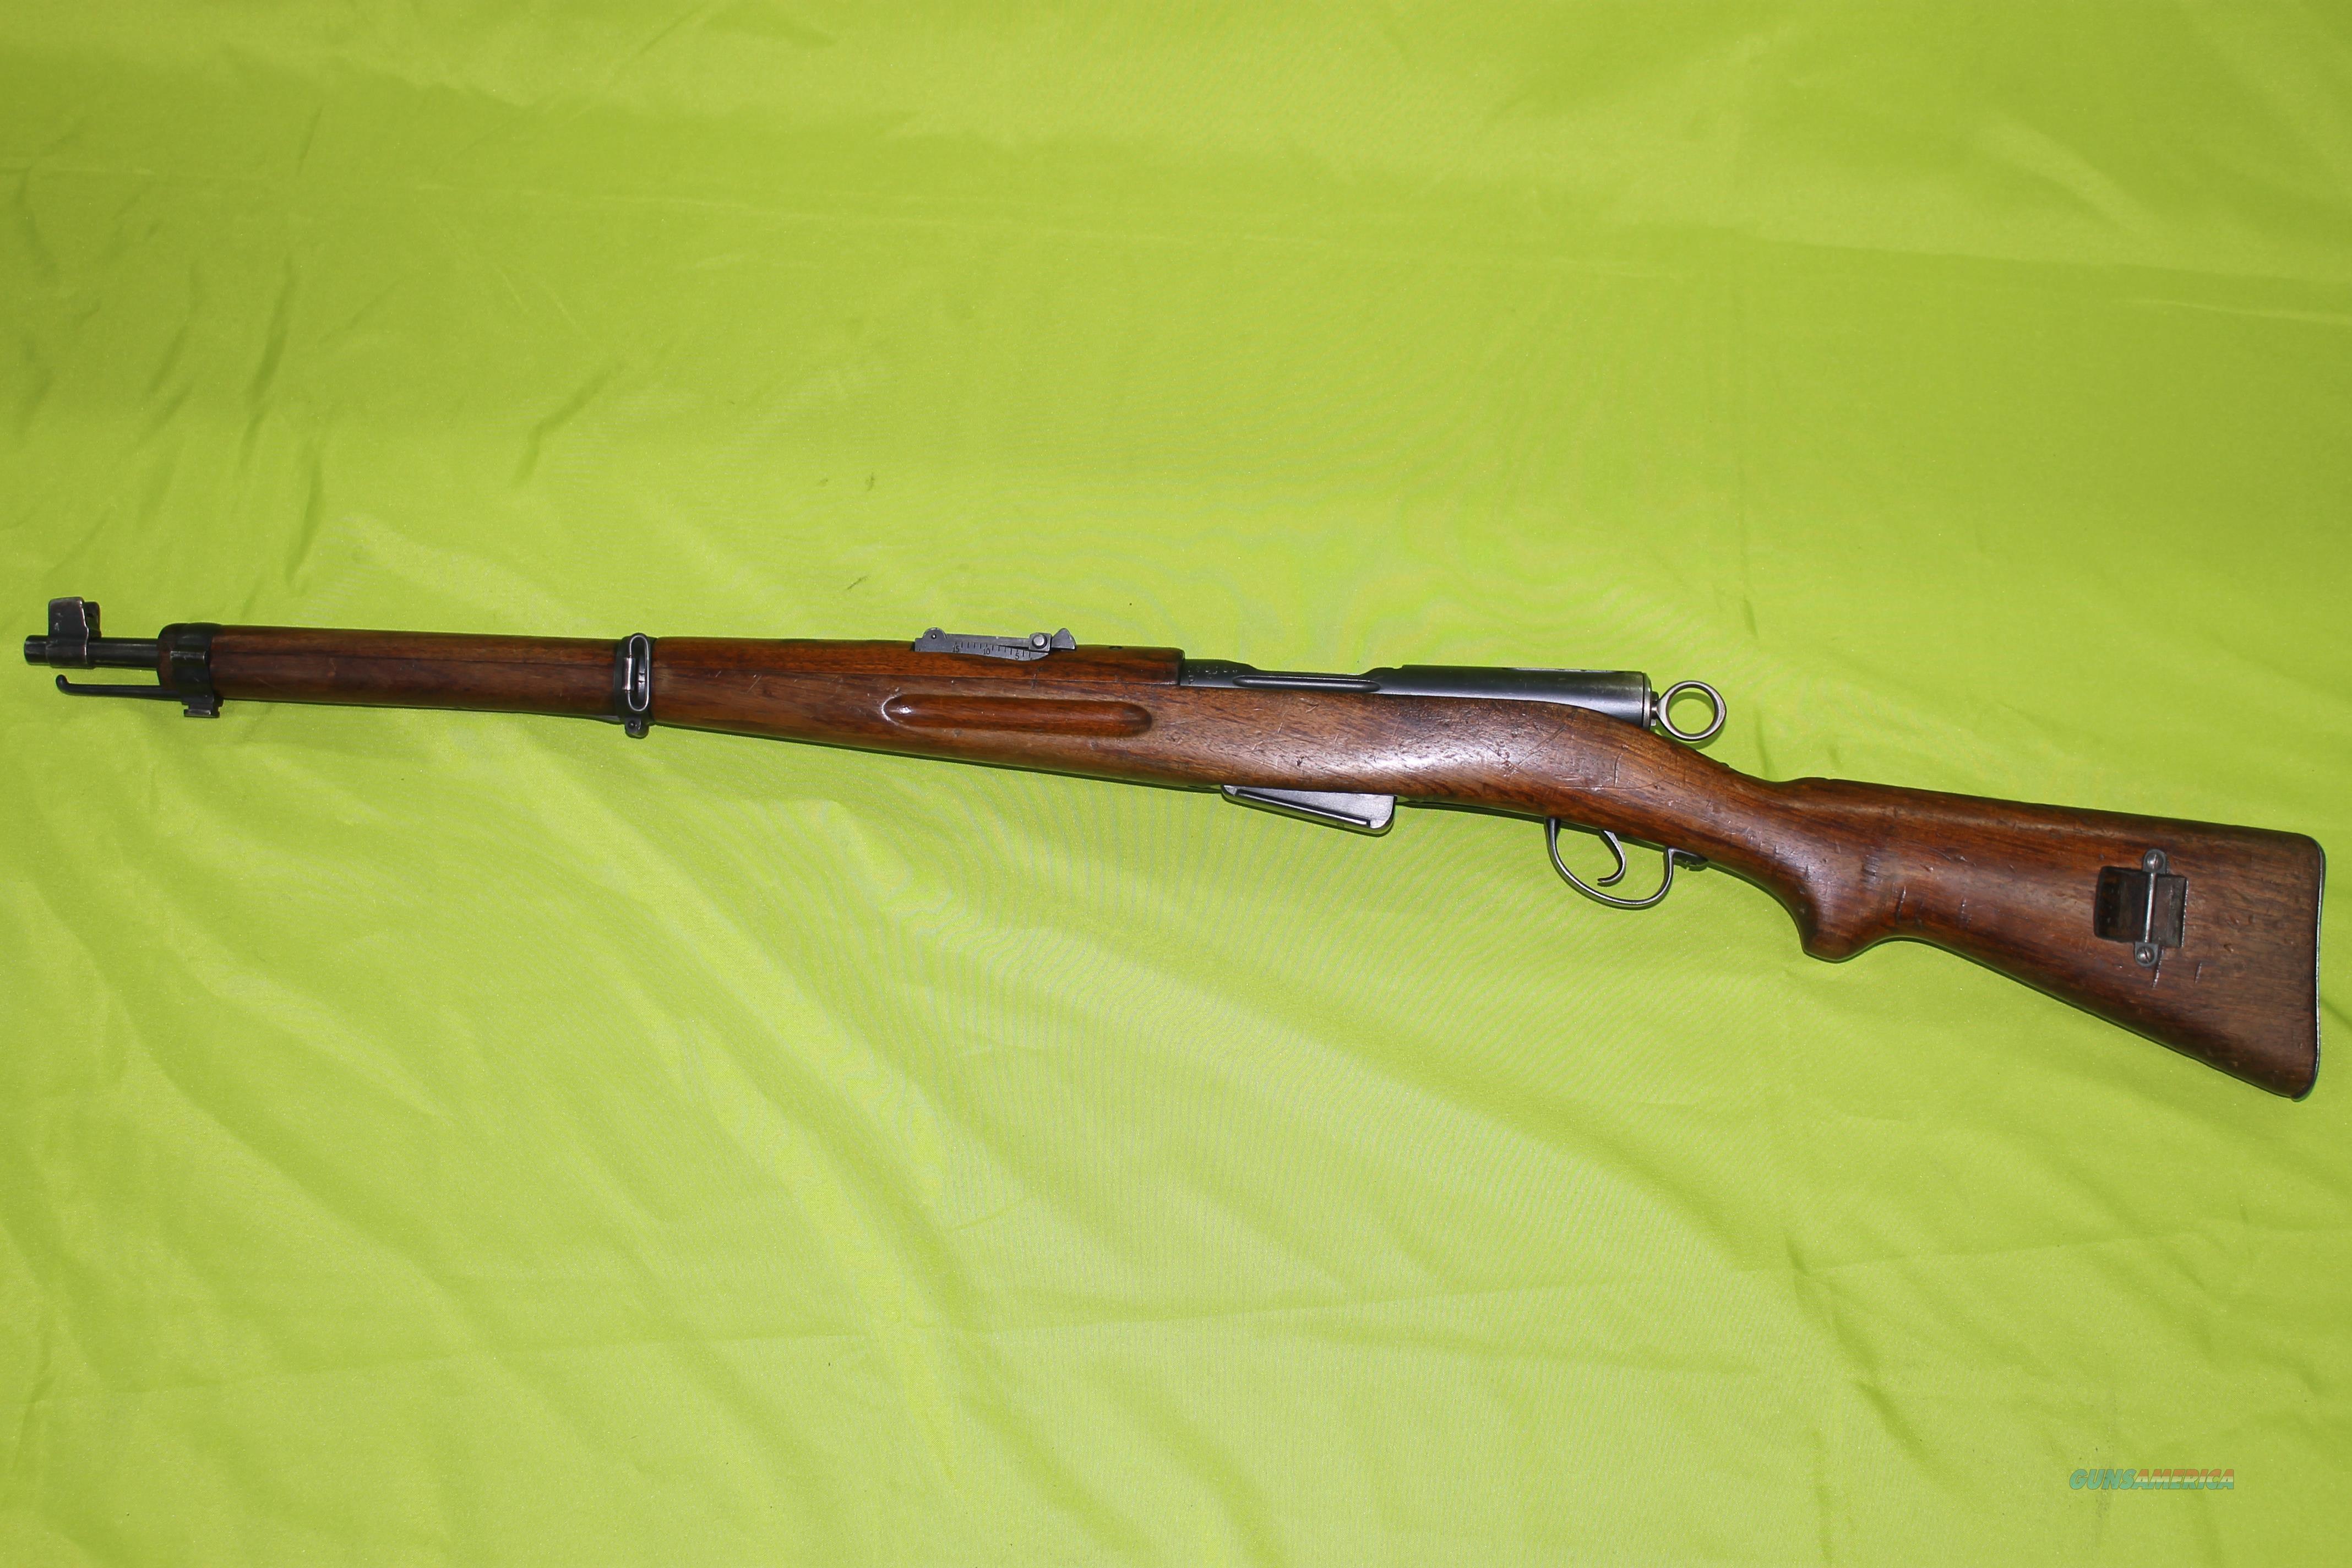 Waffenfabrik Bern K11 Swiss Rifle C&R for sale